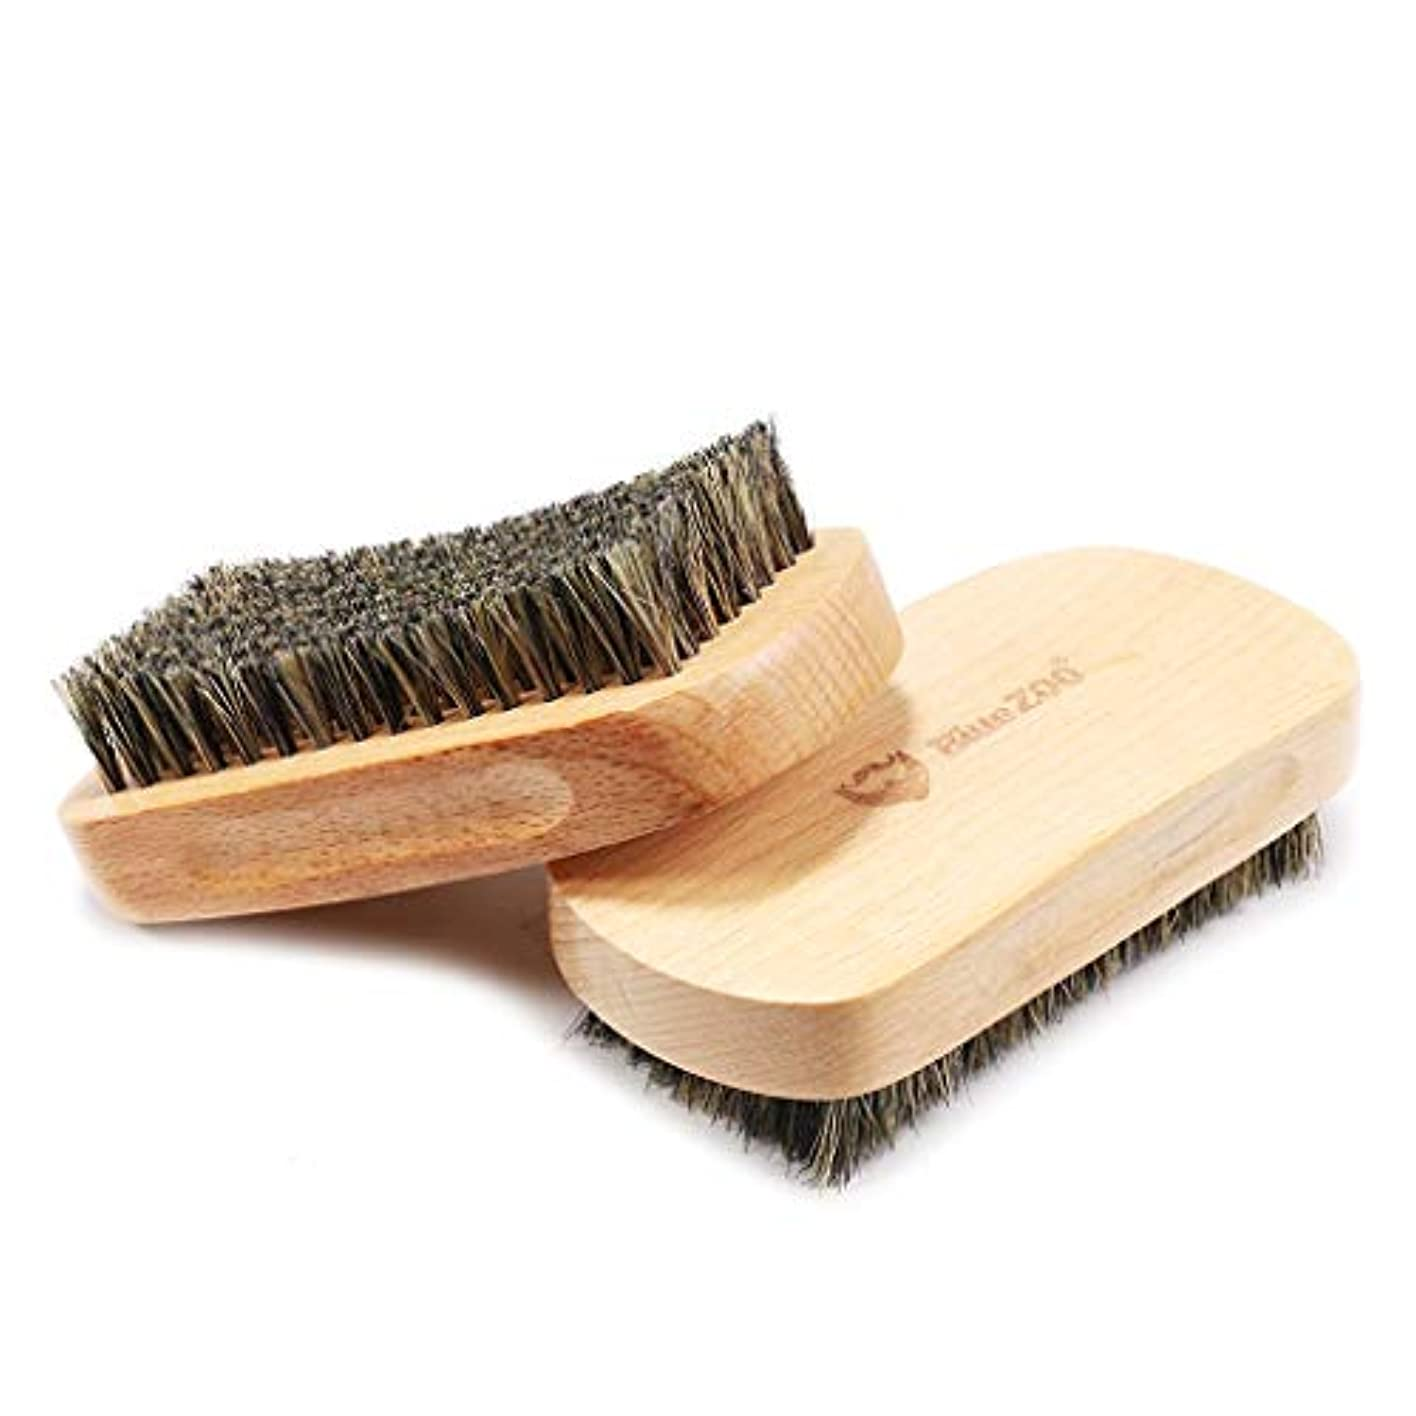 P Prettyia ひげブラシ シェービングブラシ メンズ 毛髭ブラシ ひげ剃り 硬い剛毛 理容 洗顔 髭剃り